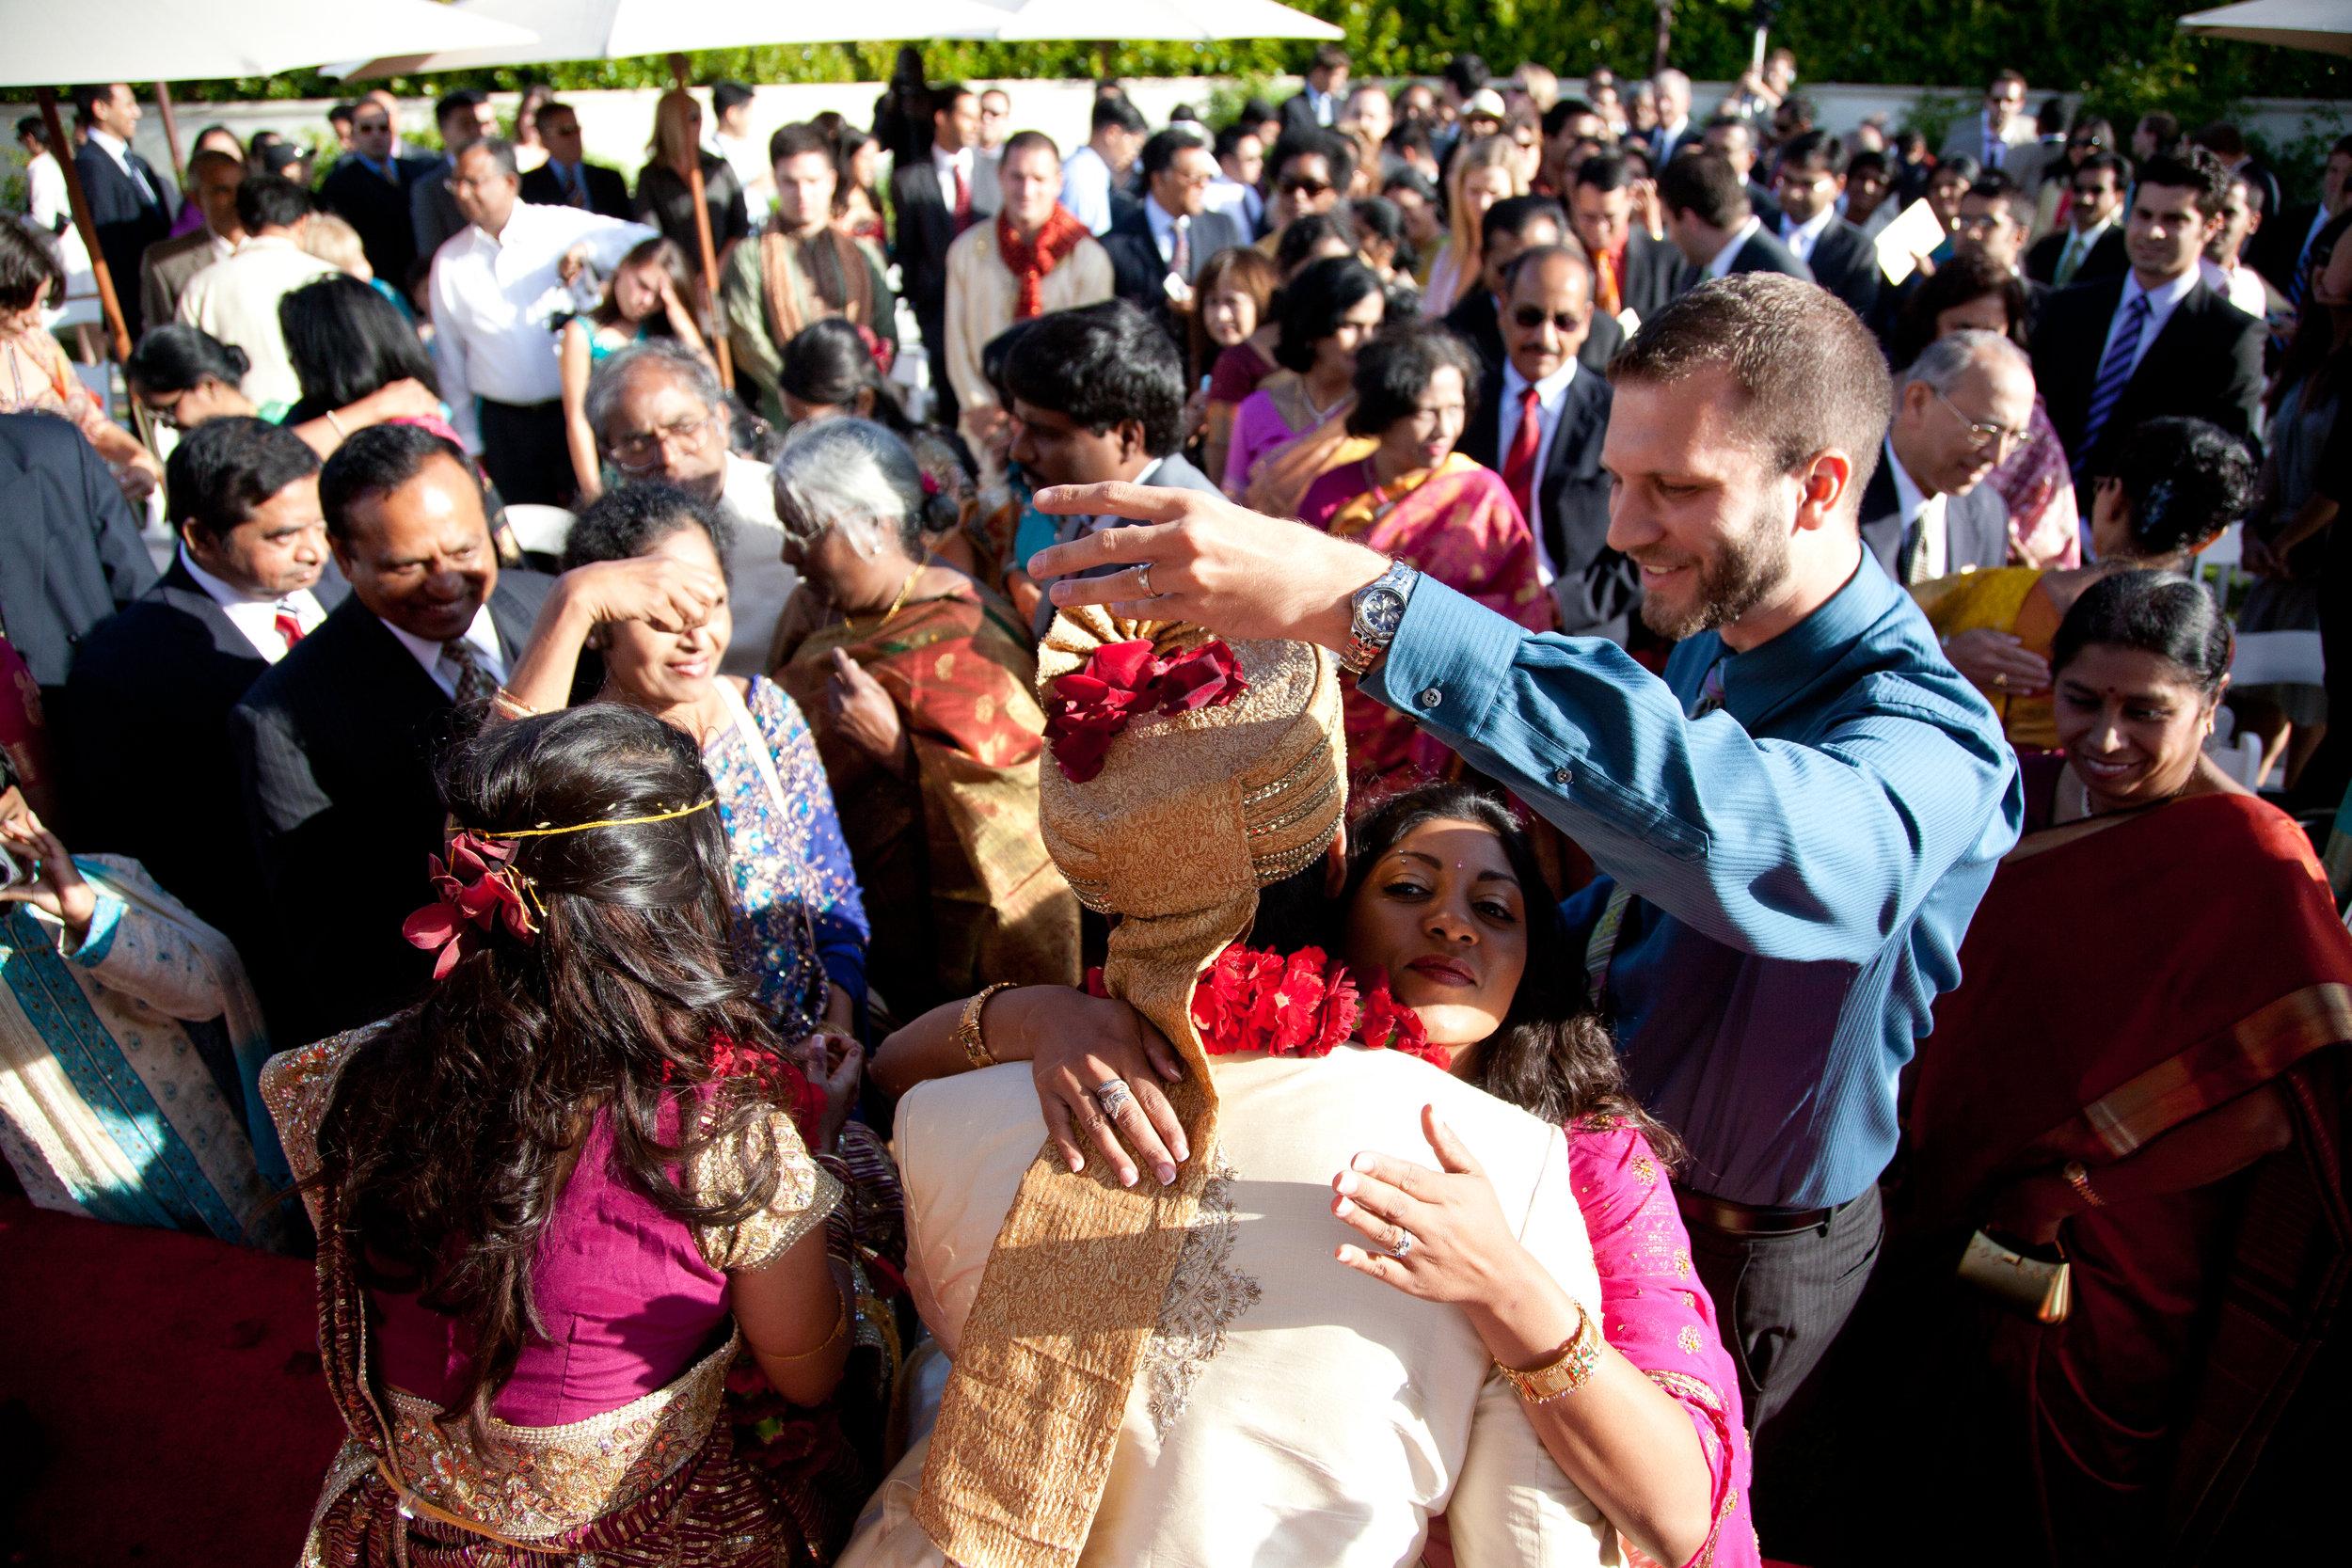 Southeast Asian Wedding Photo58.jpg